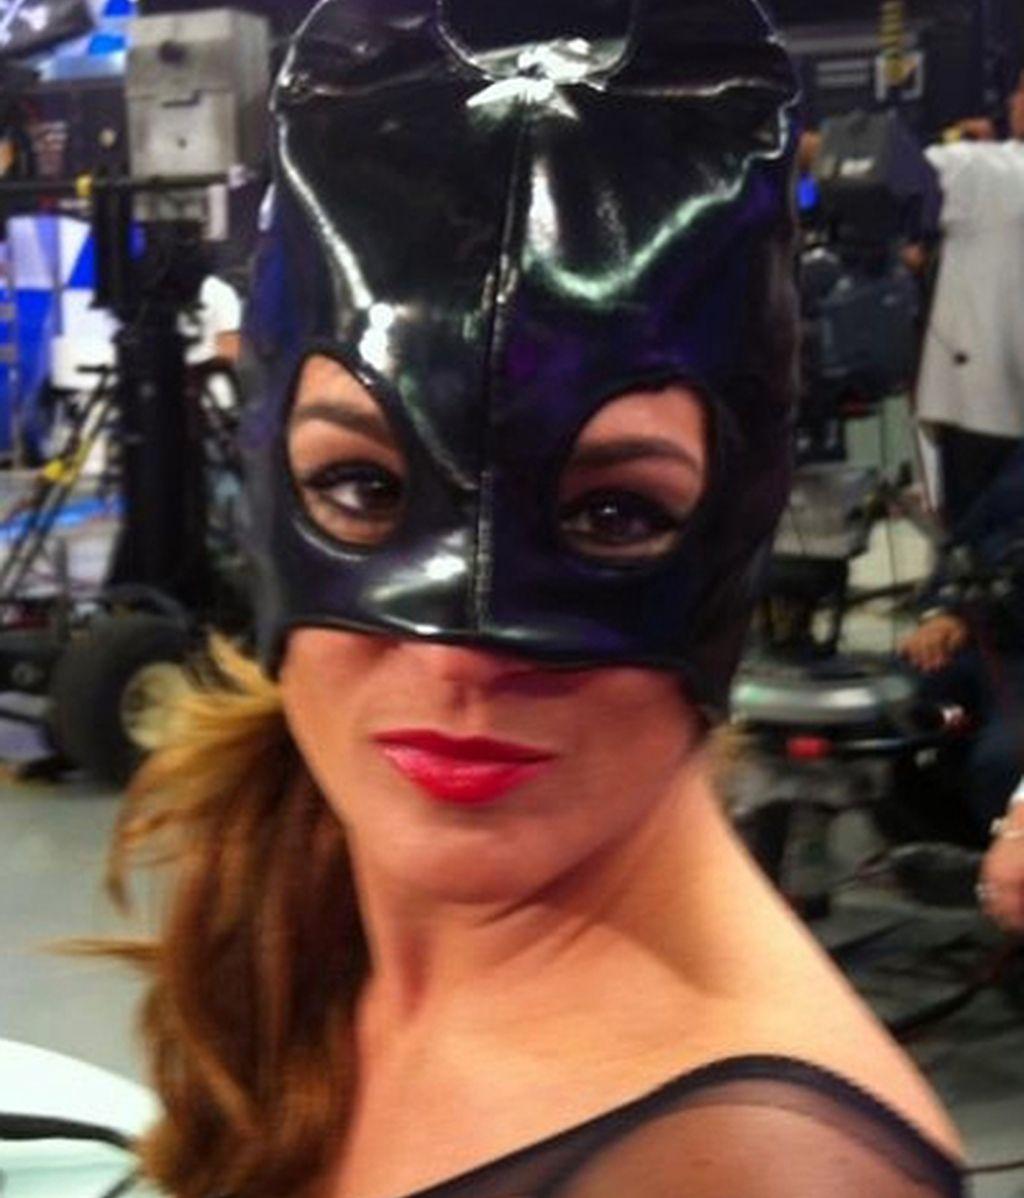 Raquel Bollo, la auténtica Catwoman